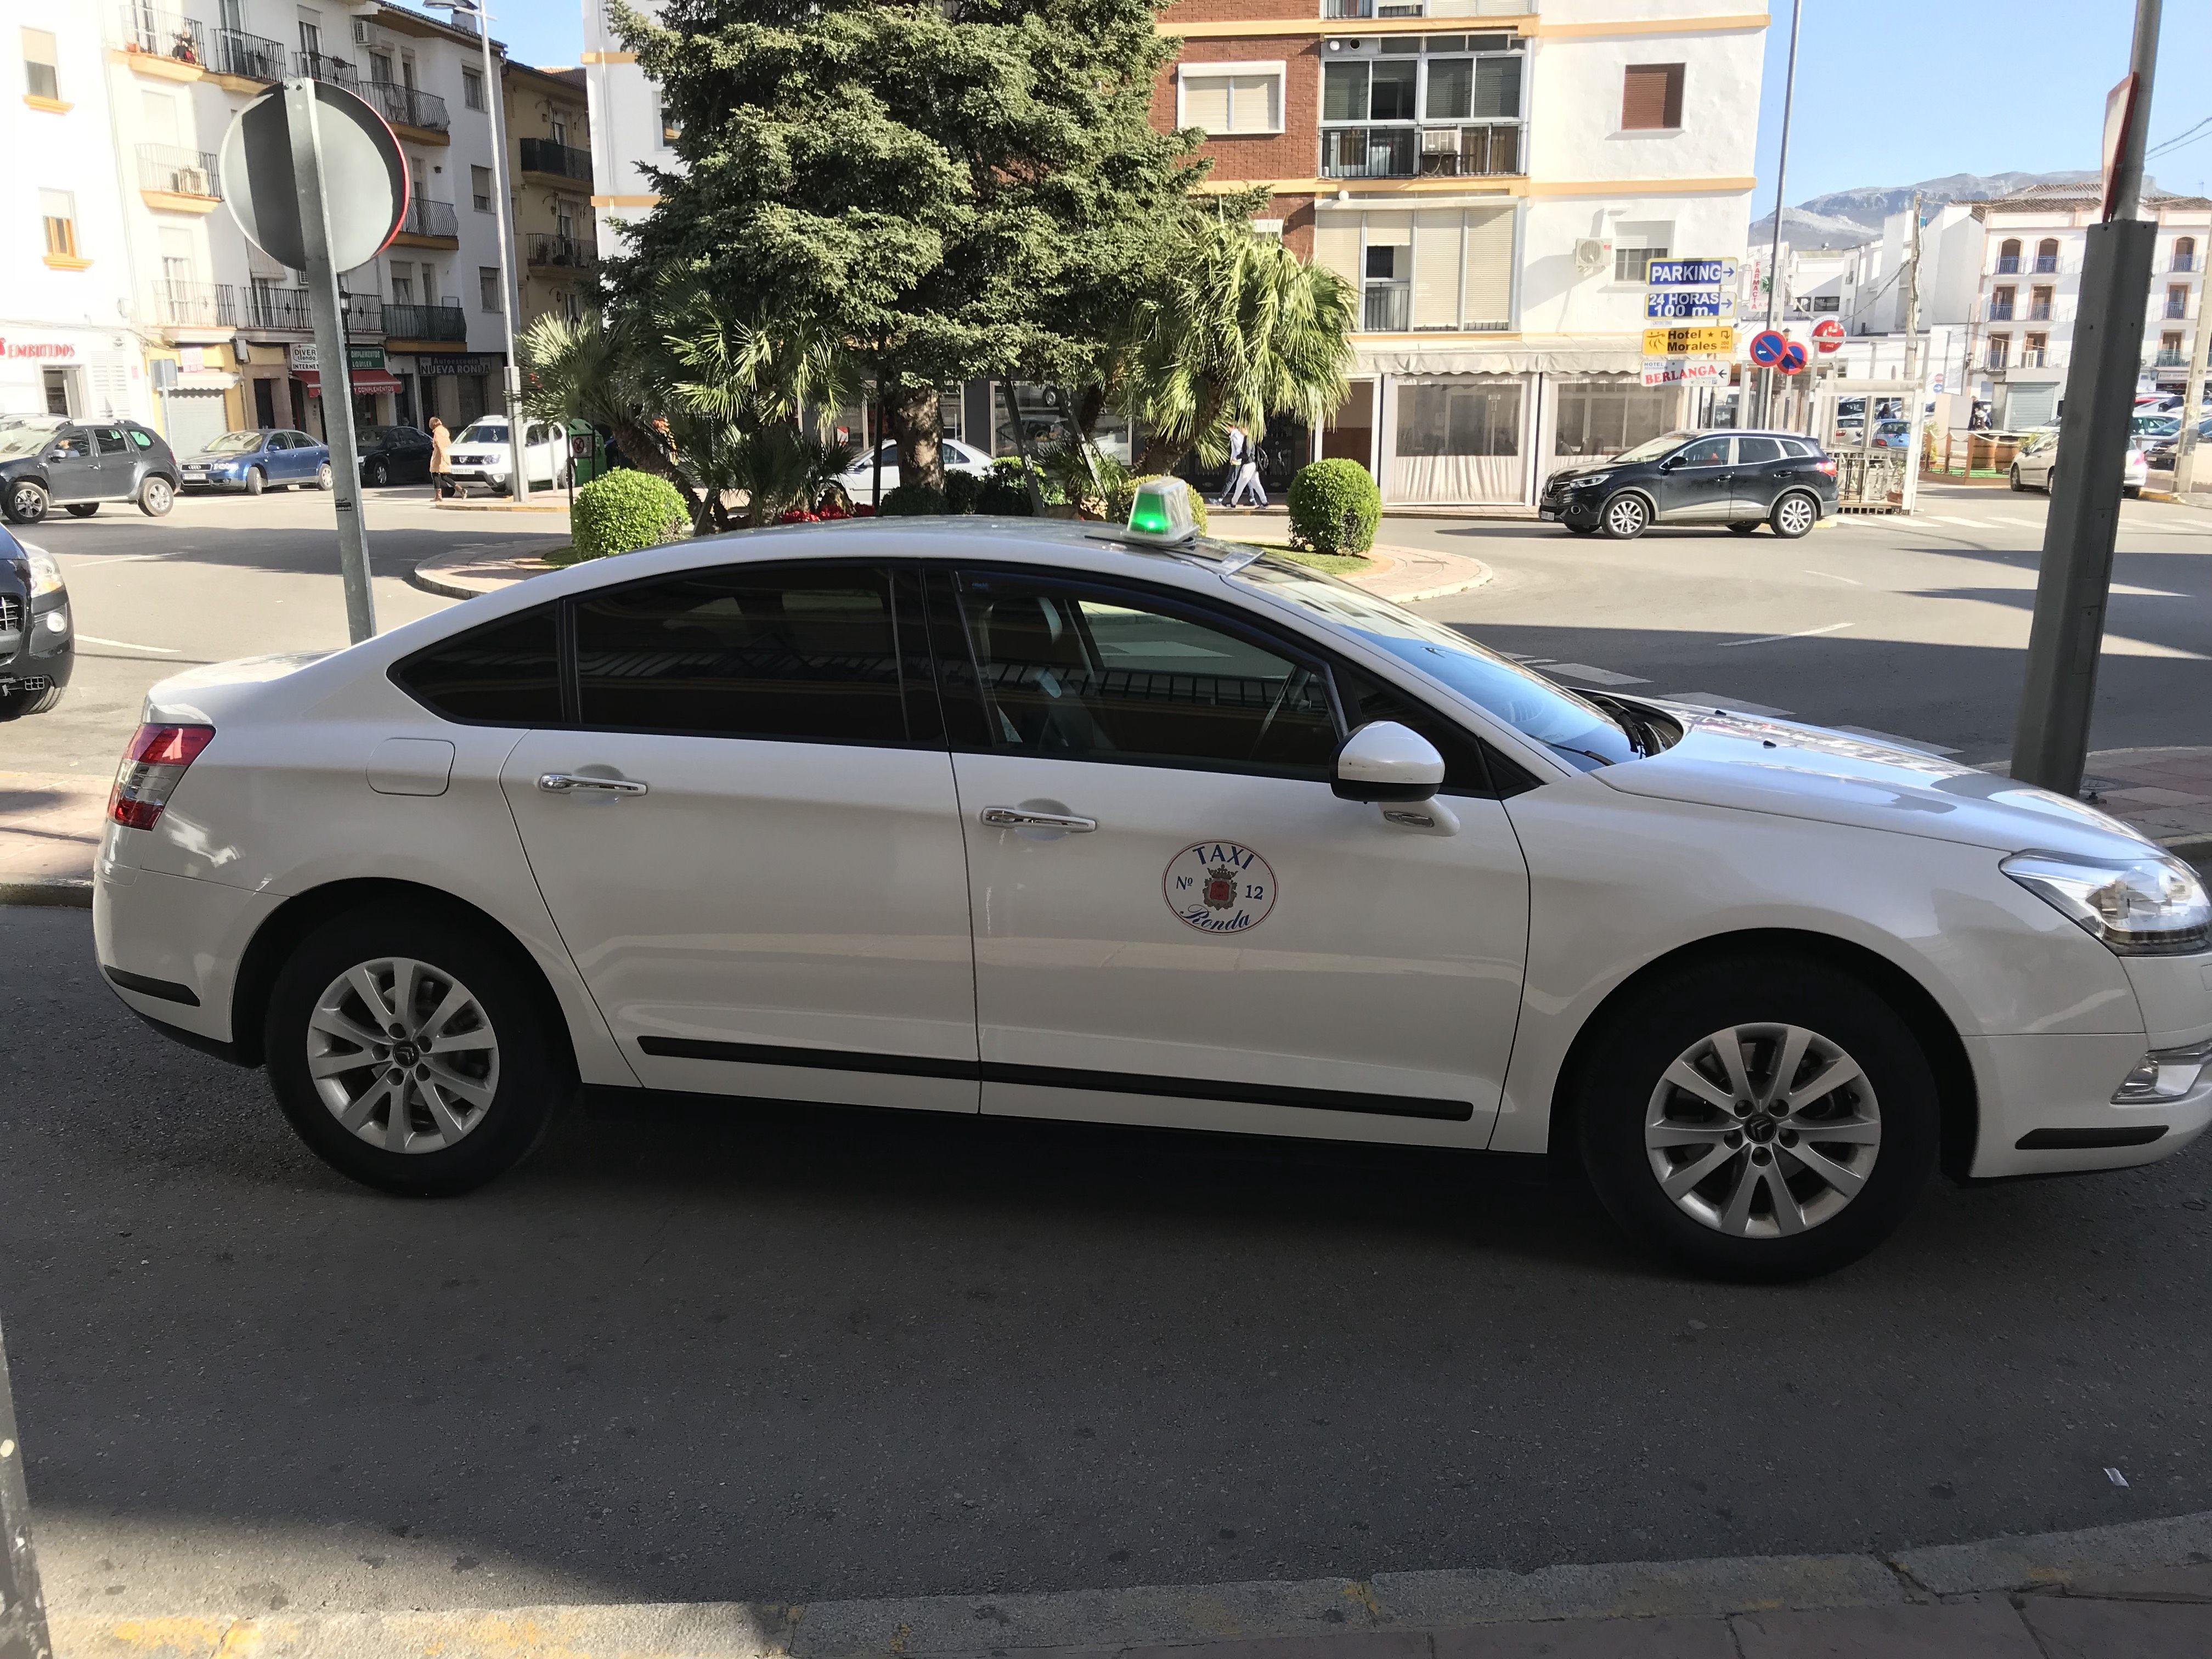 Taxi de largo recorrido en Ronda